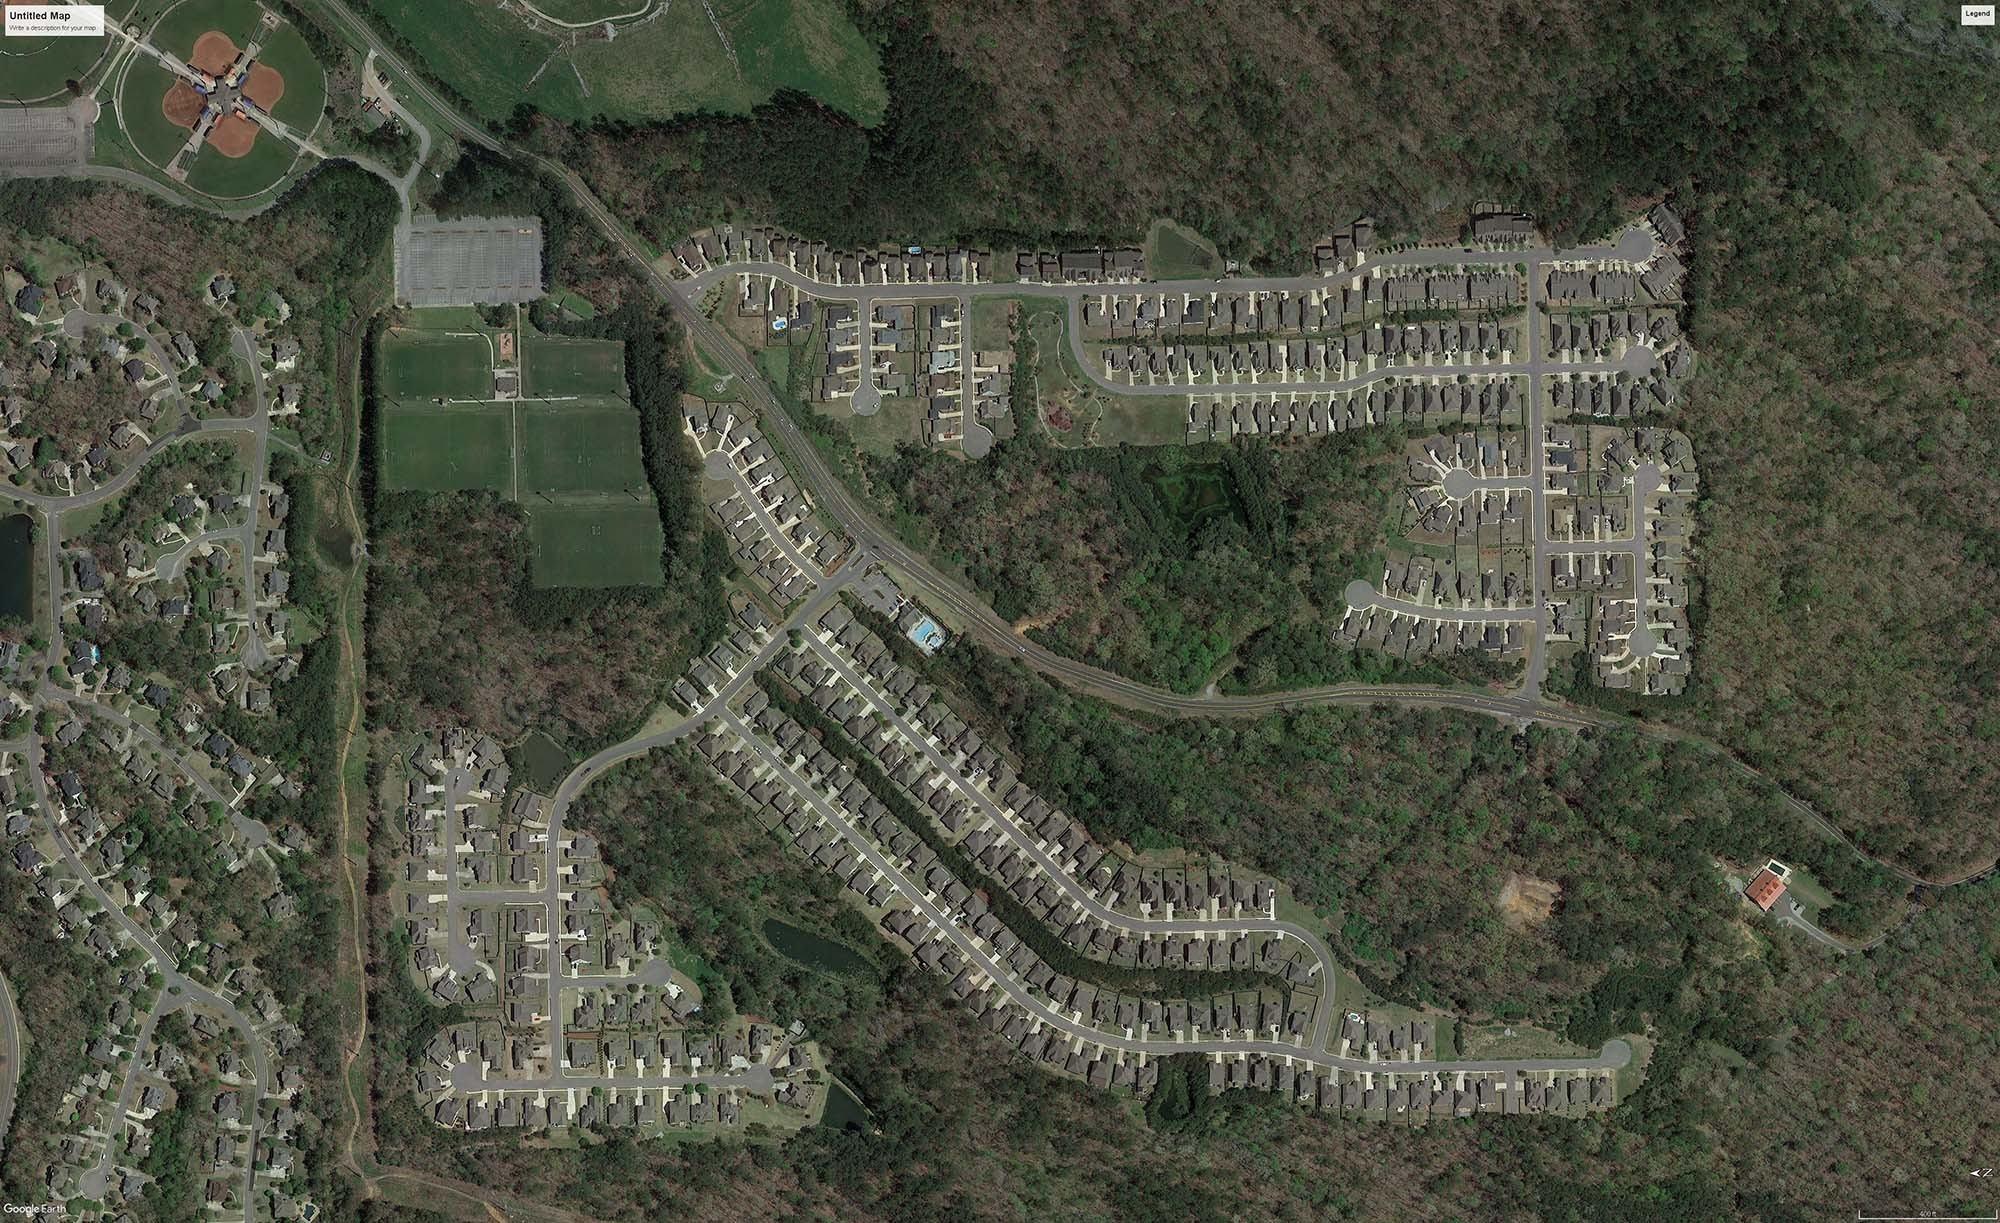 Land Surveying subdivision Gonzalez-Strength